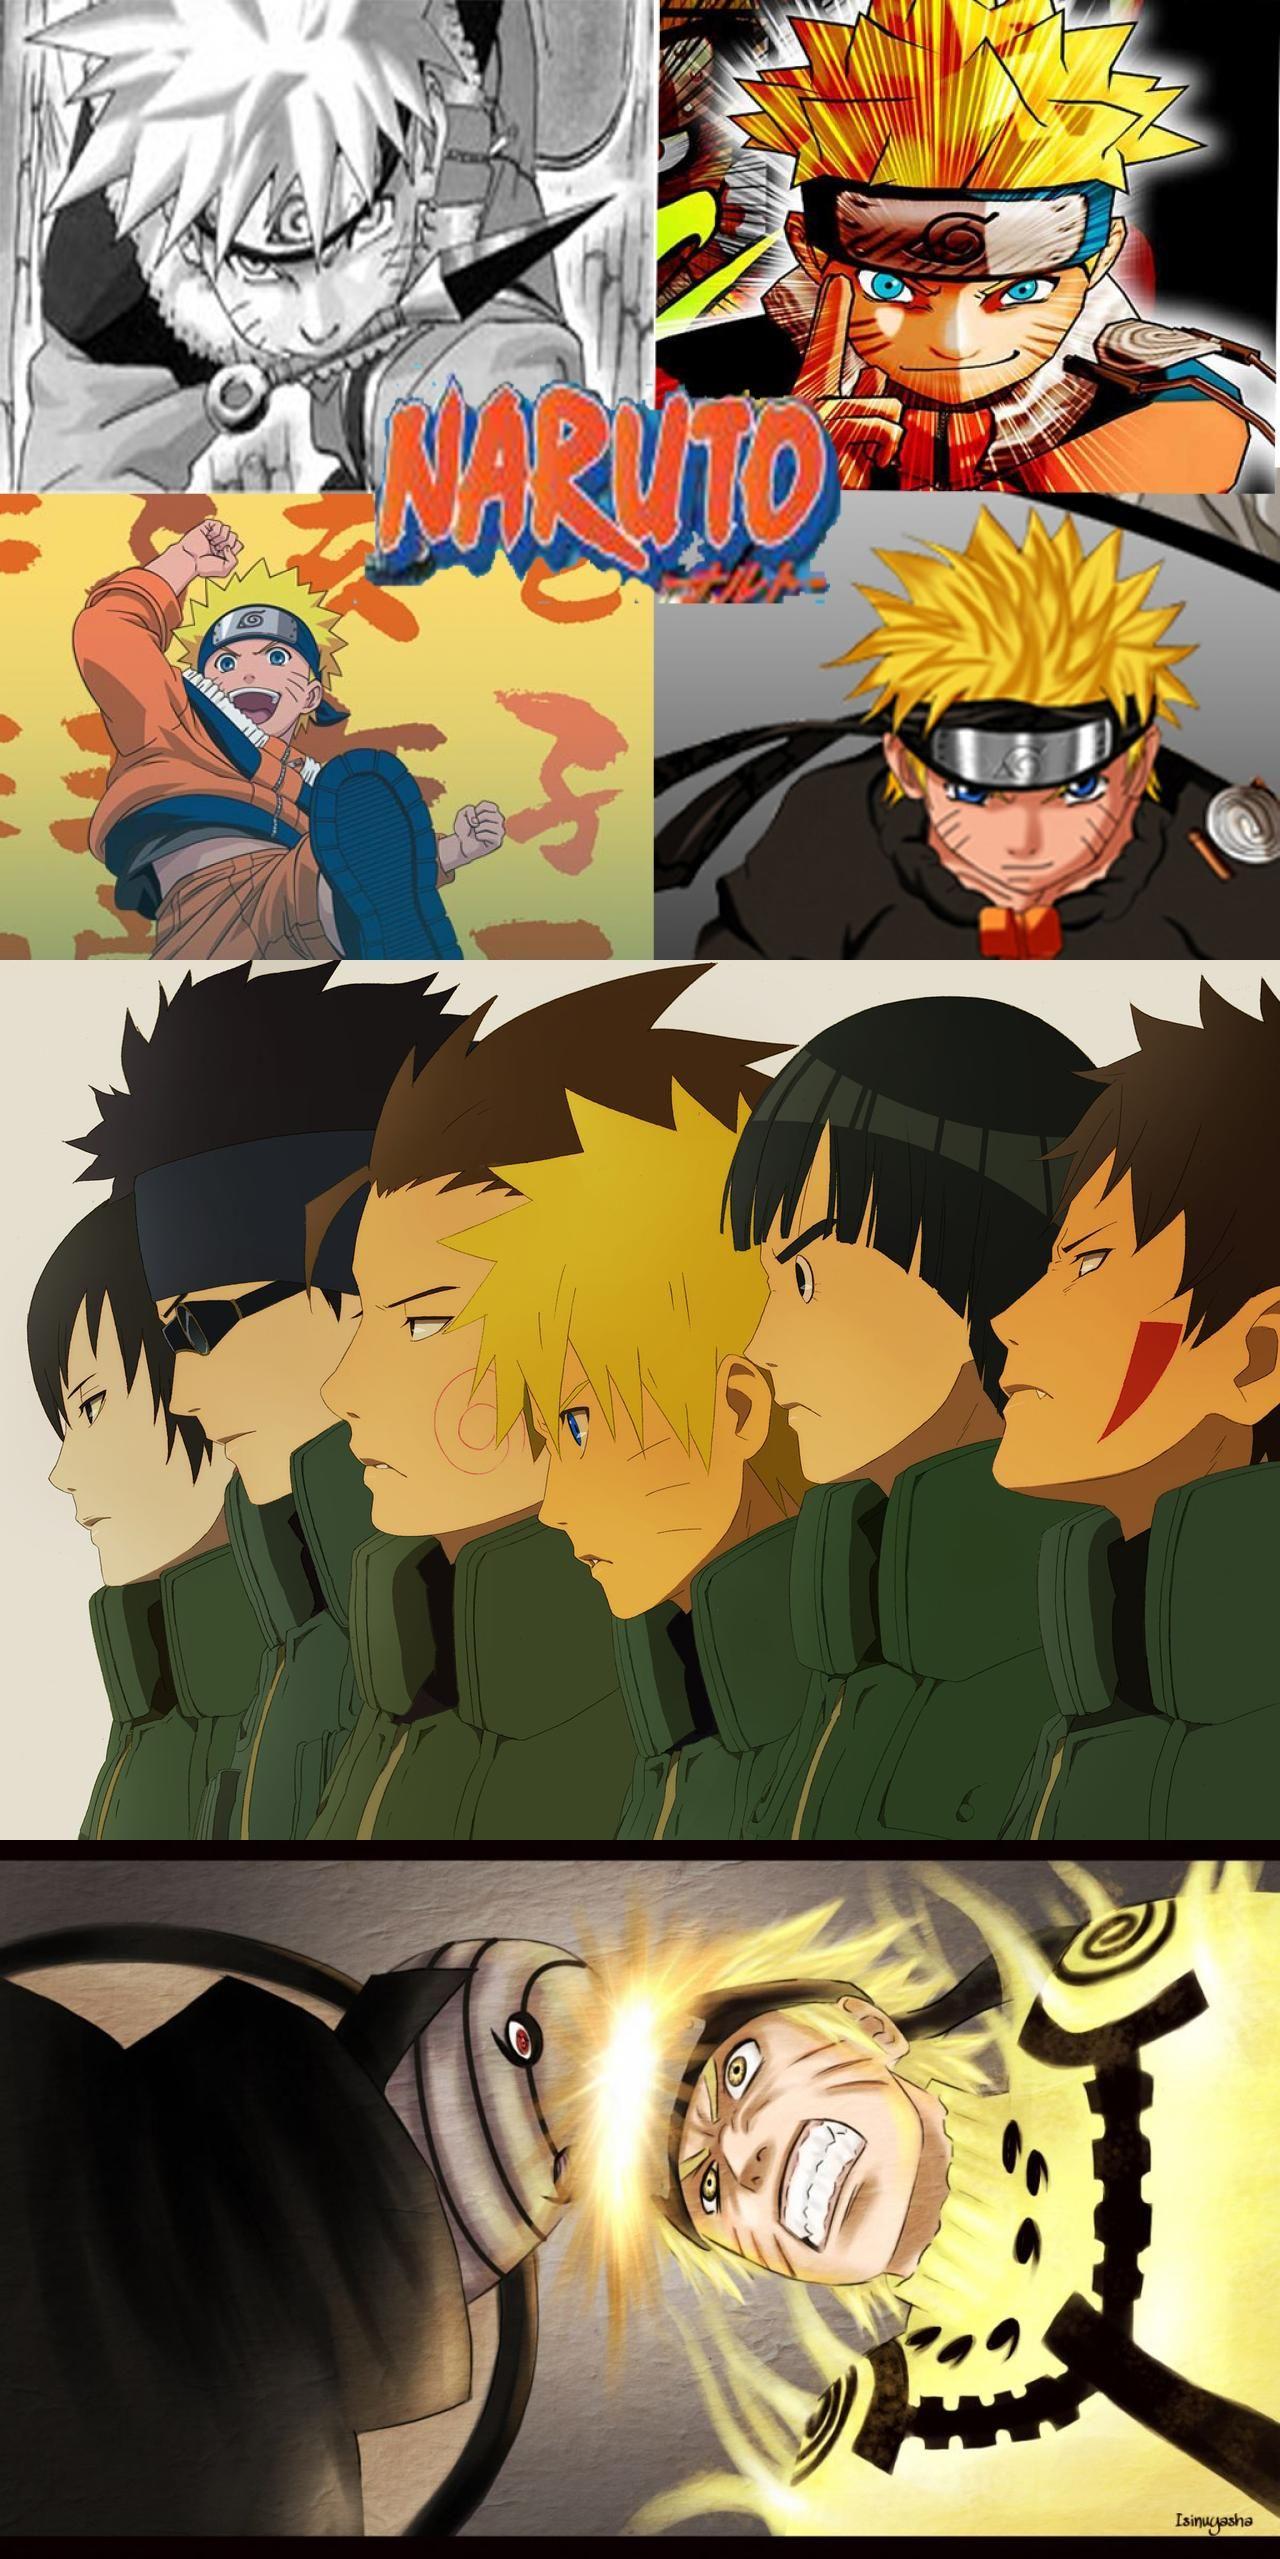 Boyz of Naruto (With images) Anime, Naruto, Comic book cover